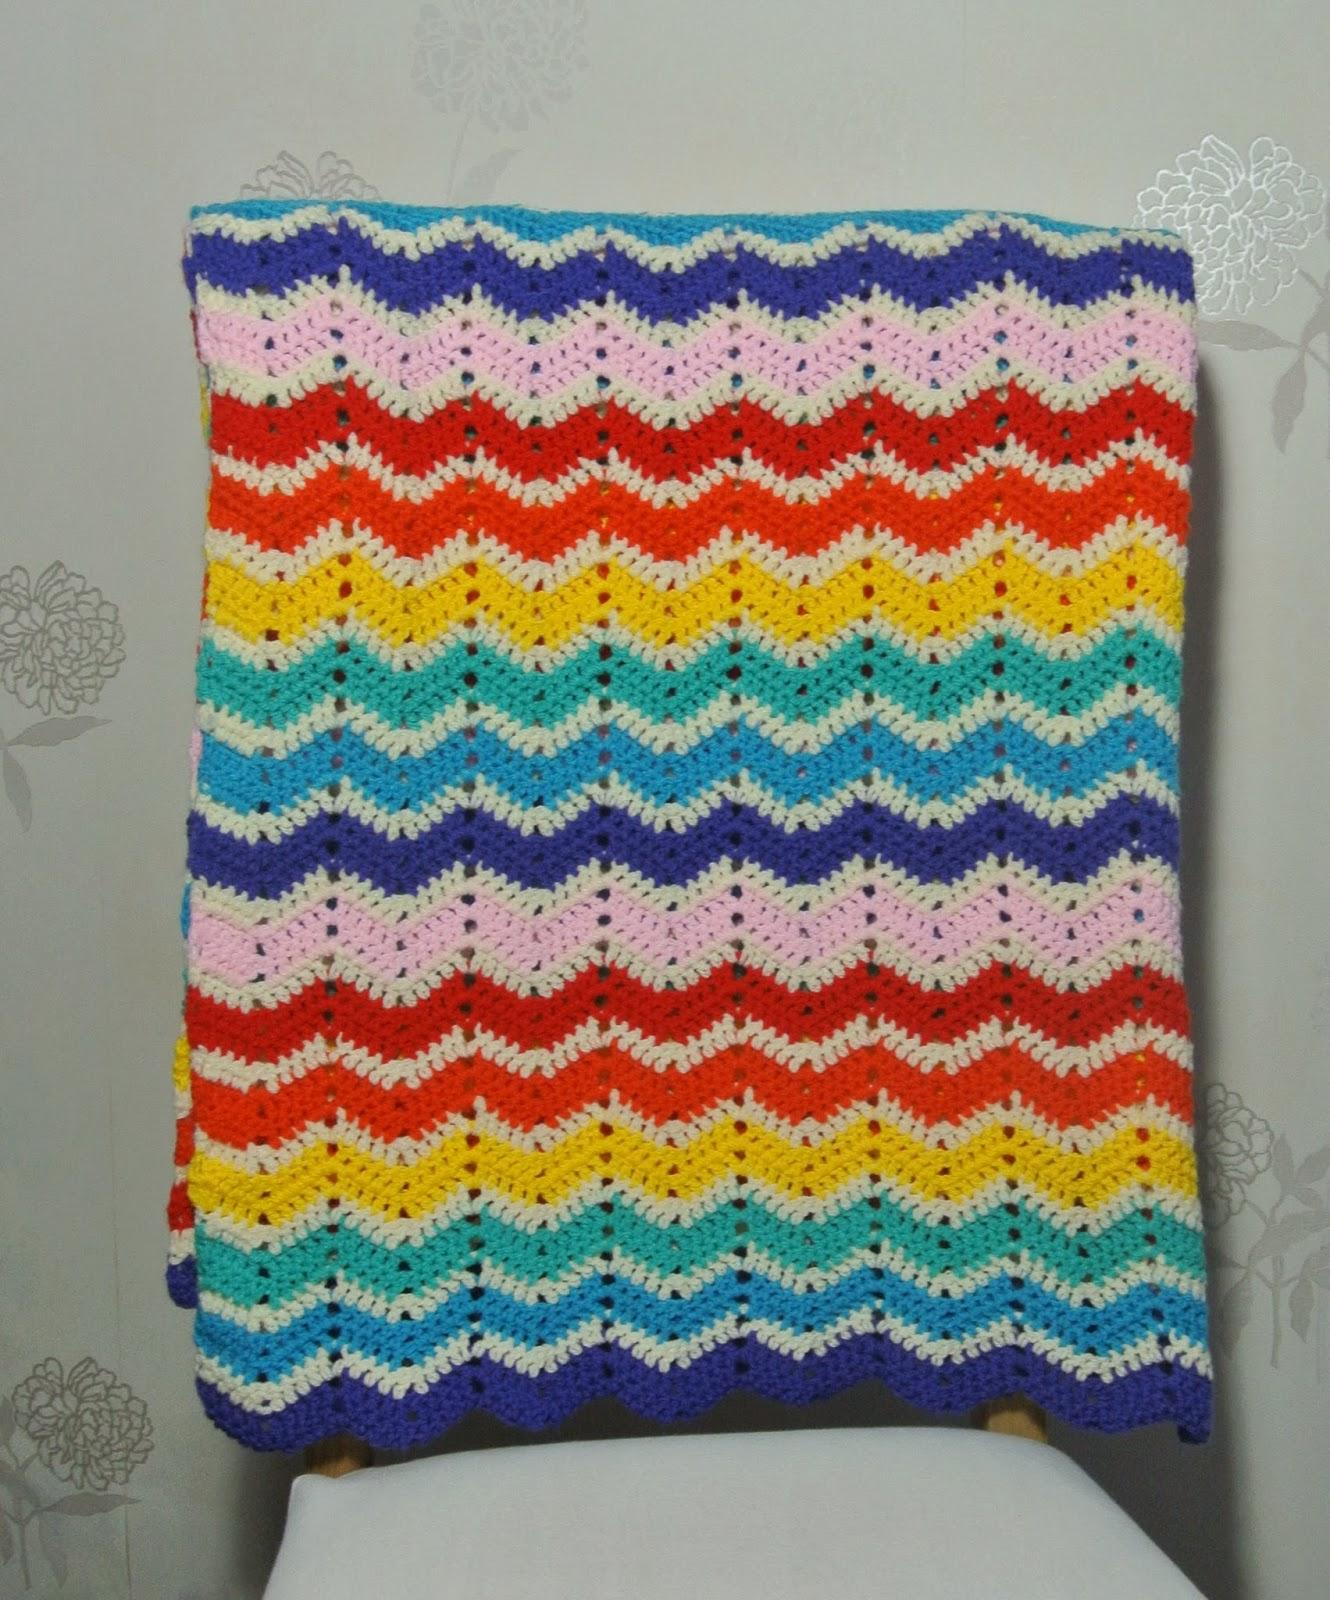 Kristelshobbydagboek Ajour Ripple Deken In Regenboogkleuren